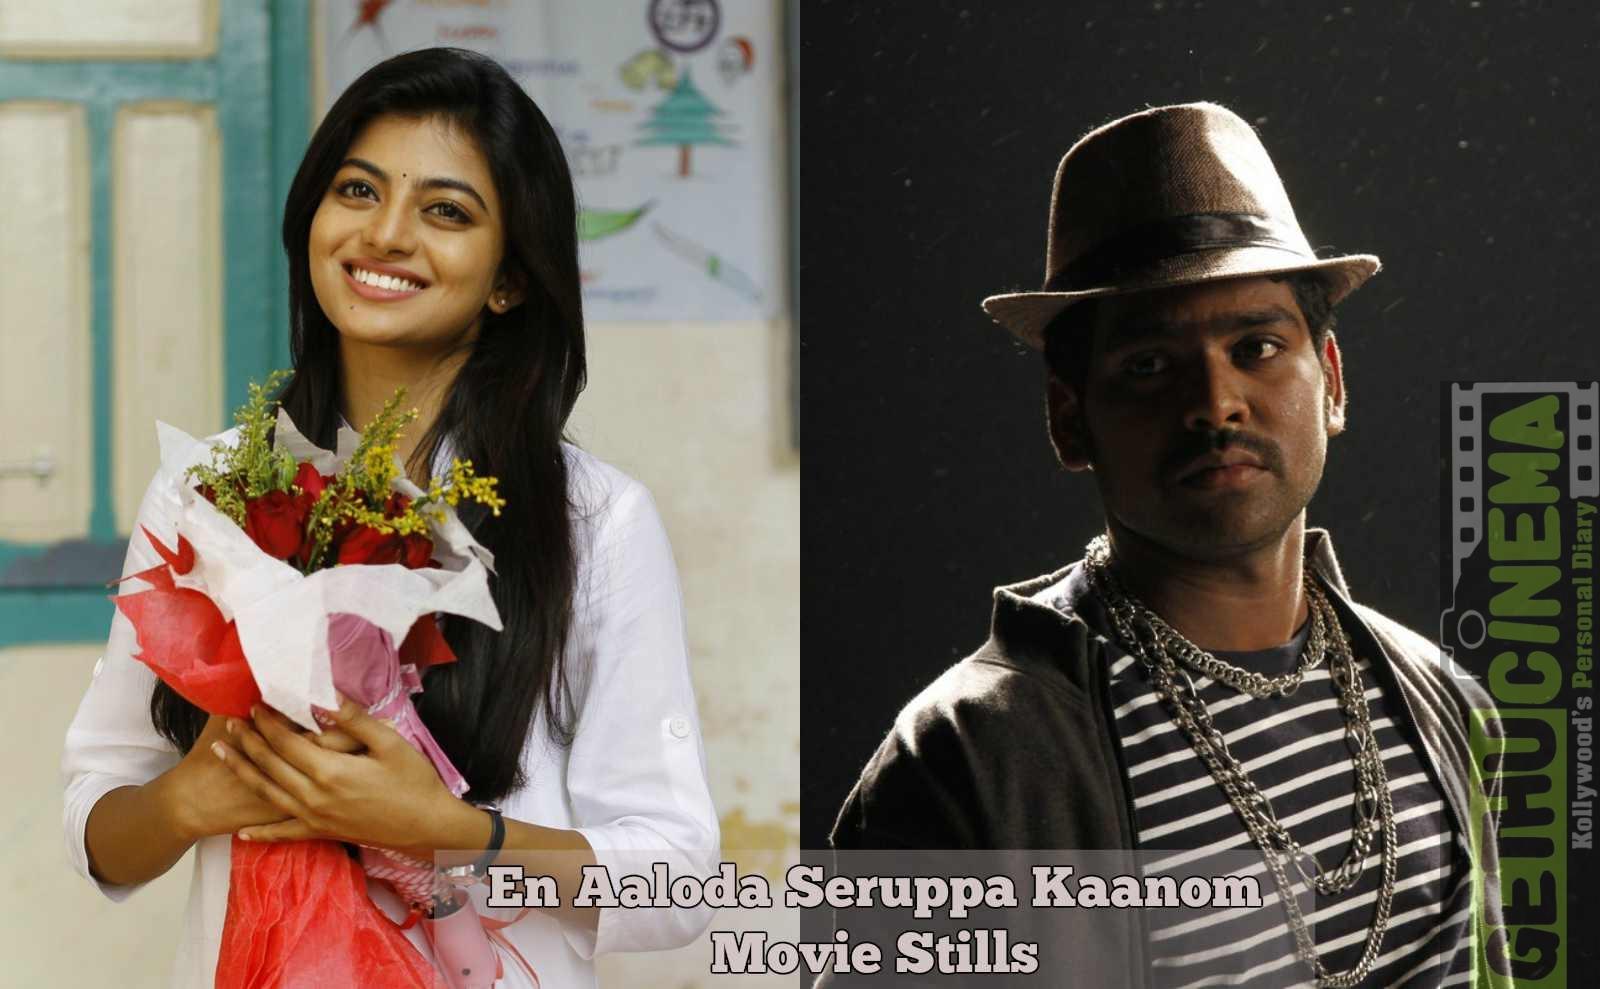 En Aaloda Seruppa Kaanom Movie Stills Gallery | Anandhi